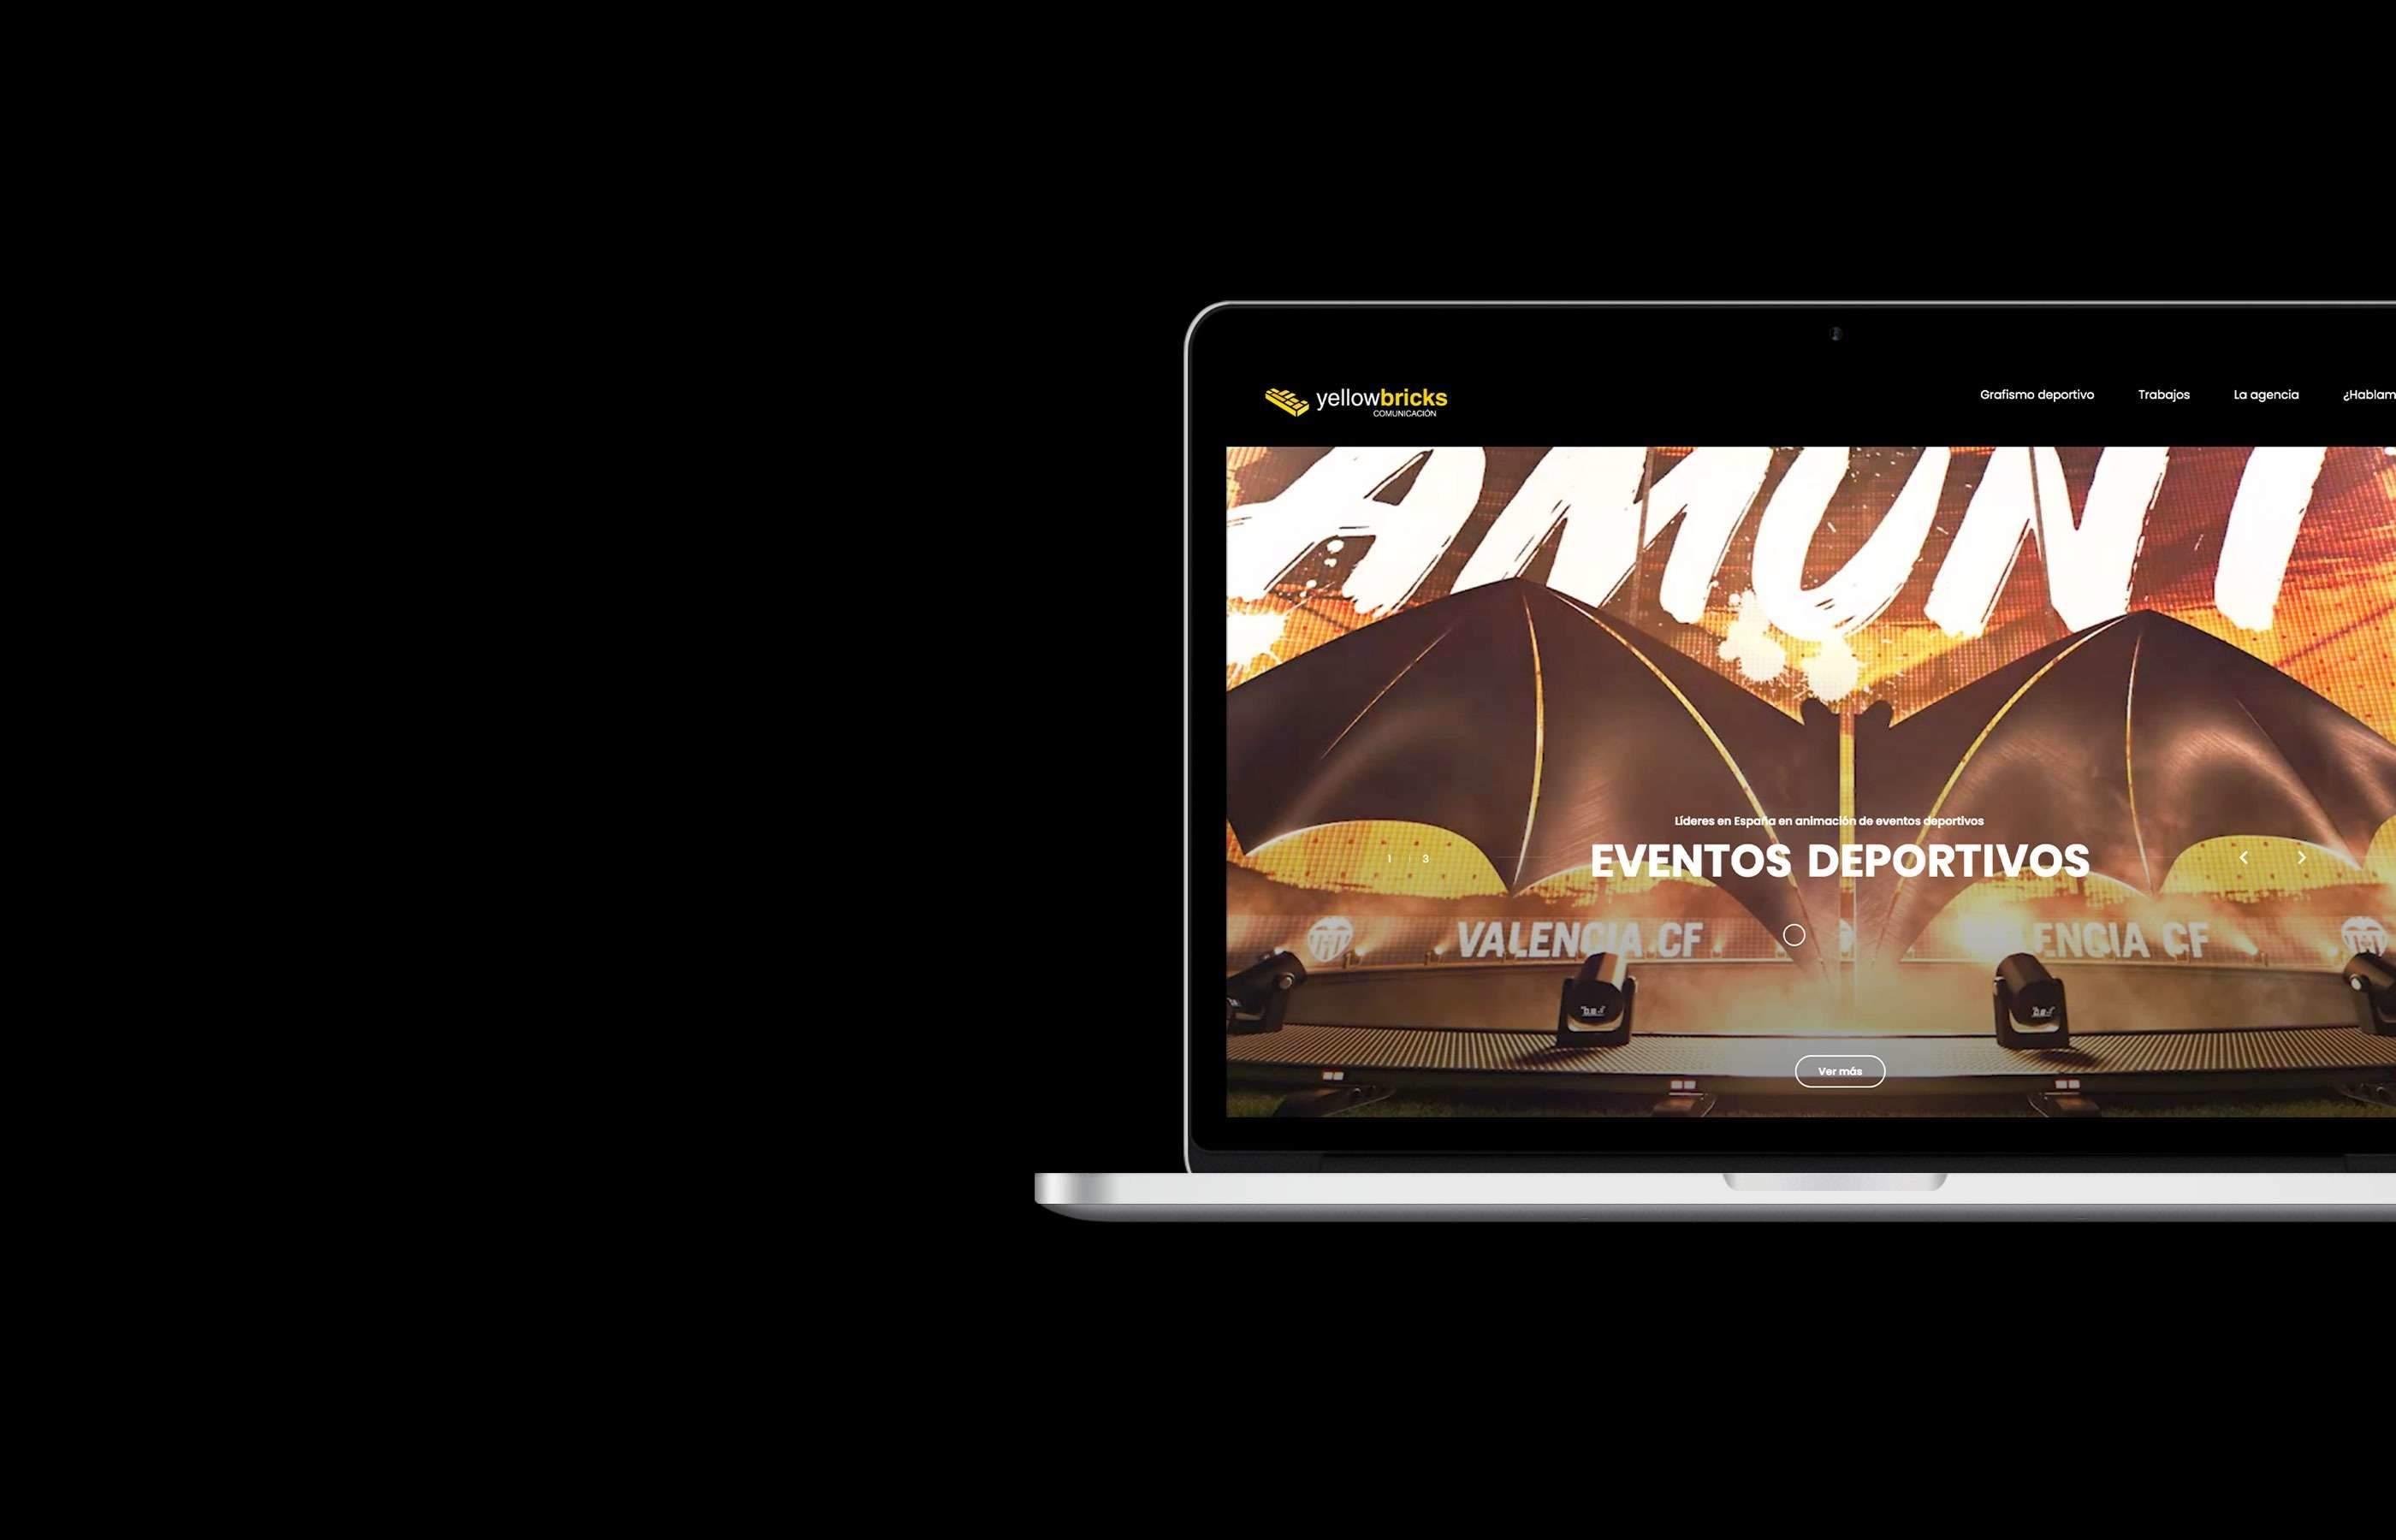 Diseño web para Yellowbricks